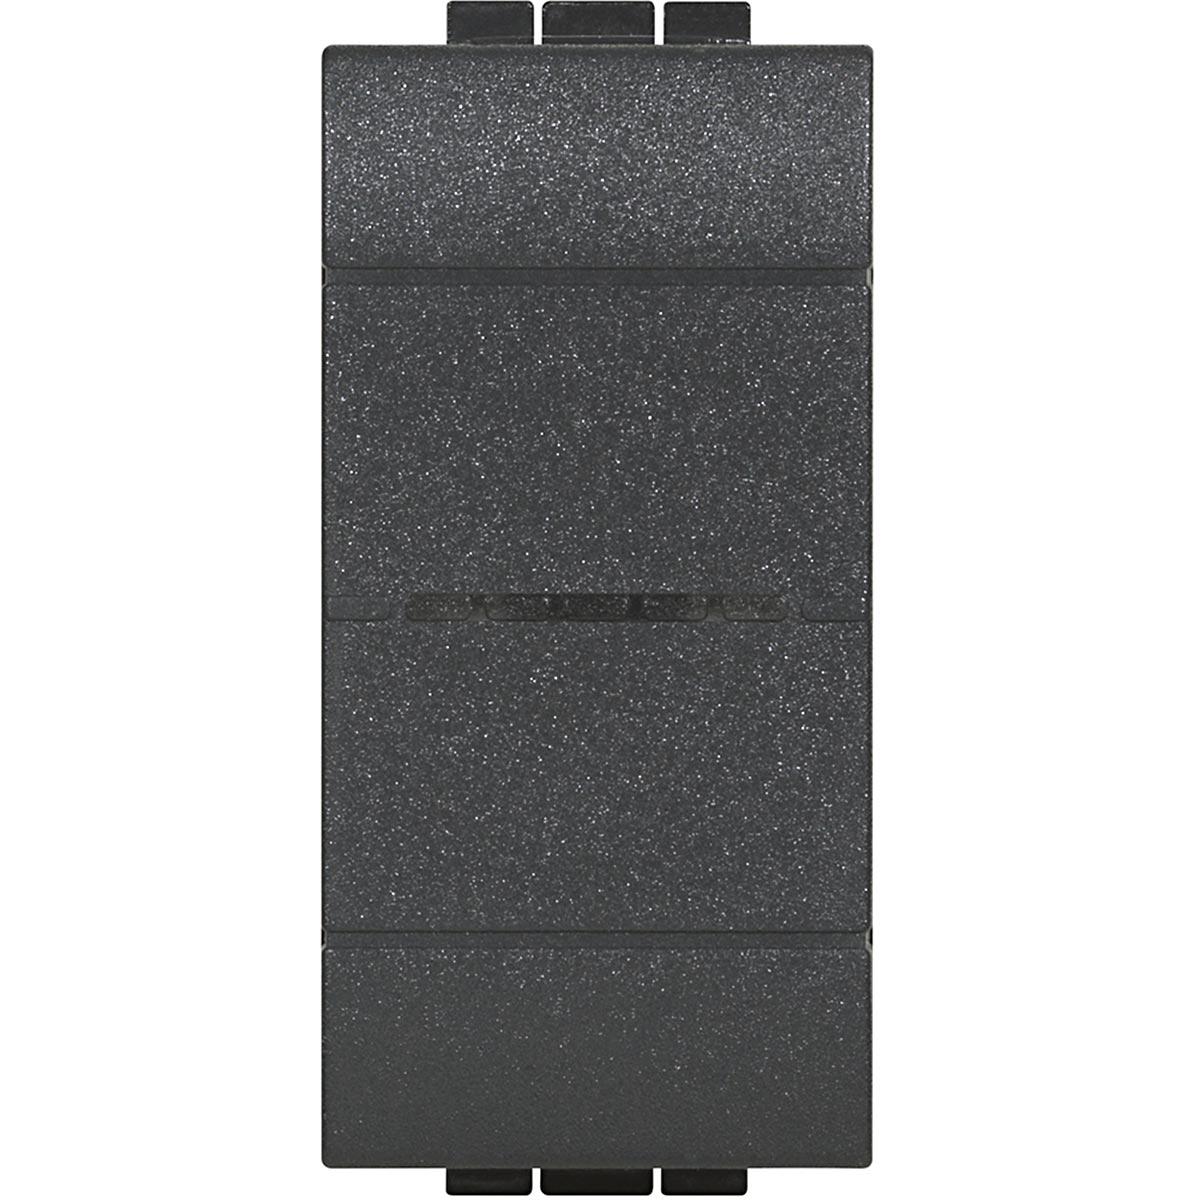 Deviatore Connesso Bticino Living International L4003C